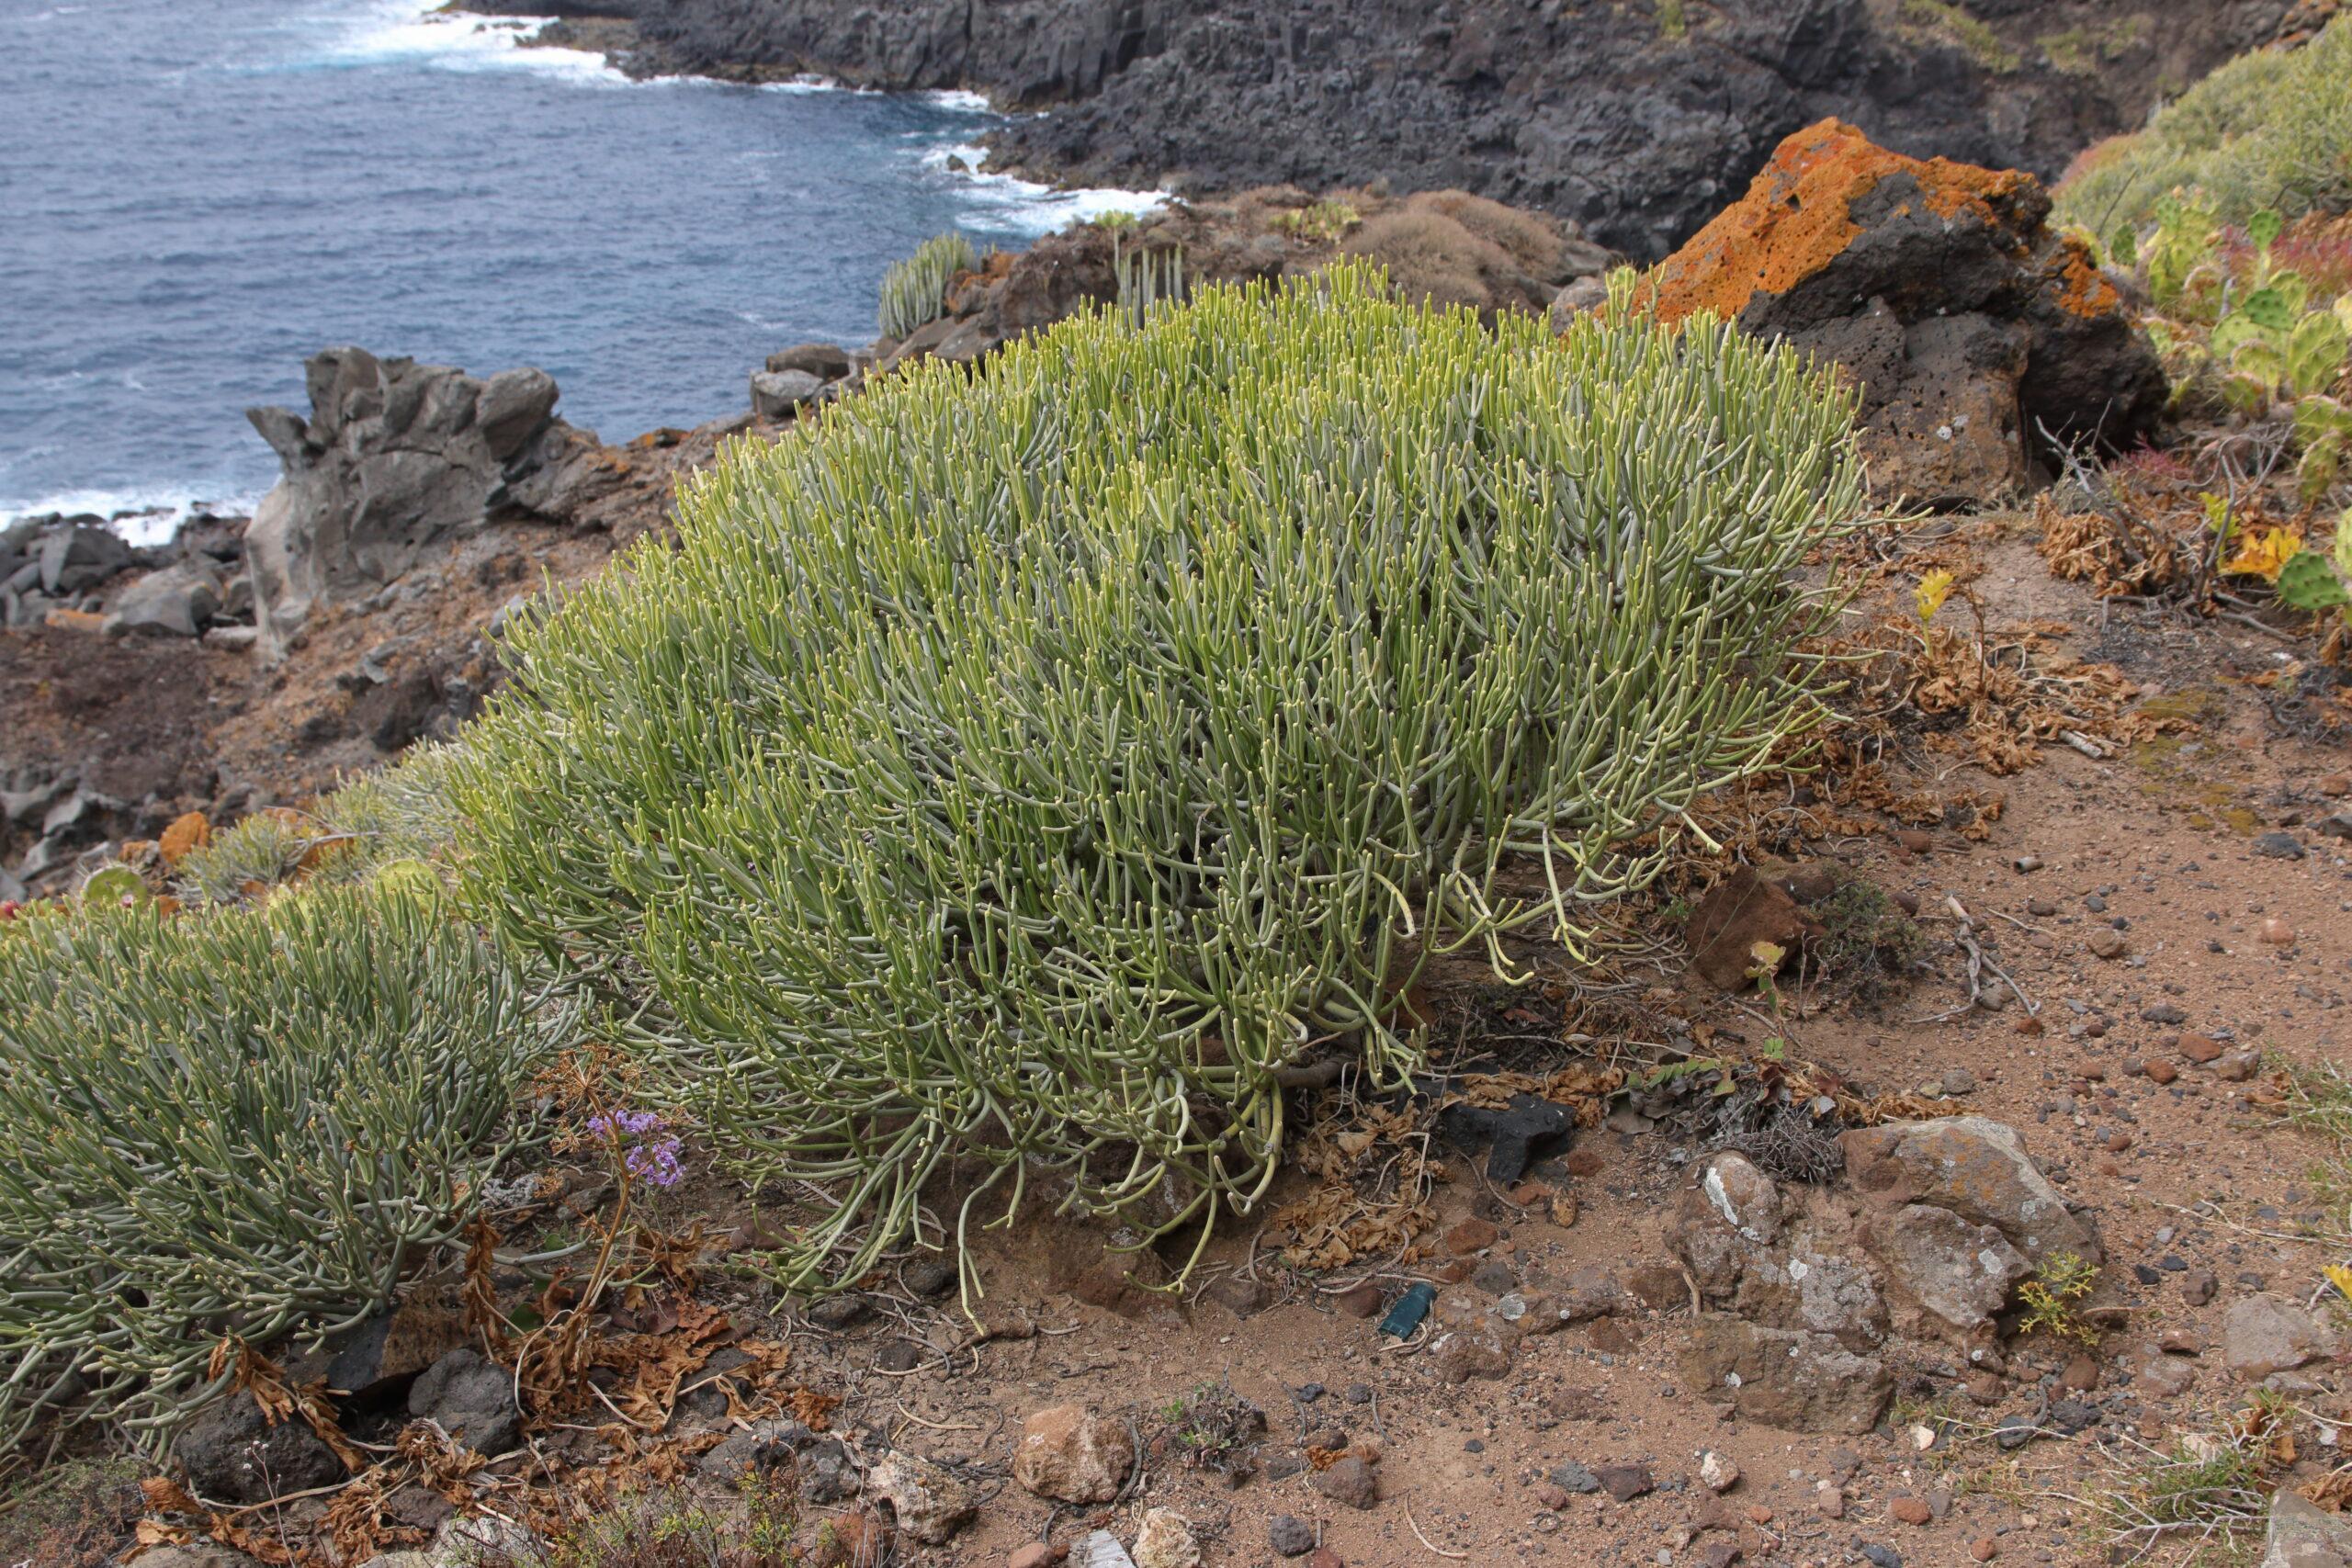 img_8540-tallos-tolda-tabaiba-salvaje-euphorbia-aphylla-con-siempreviva-imbircada-scaled.jpg